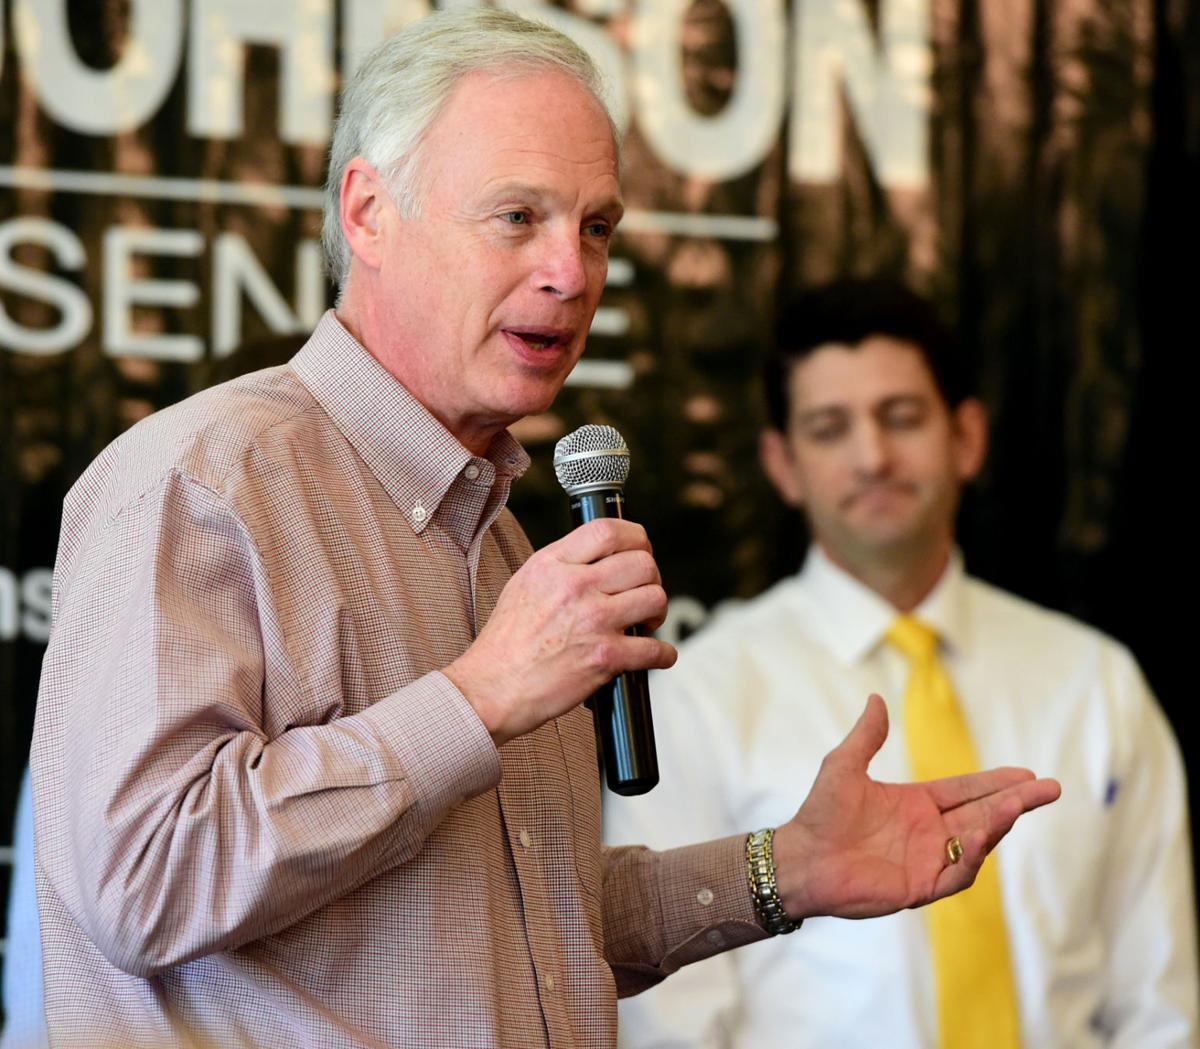 Johnson and Ryan Campaign in Burlington